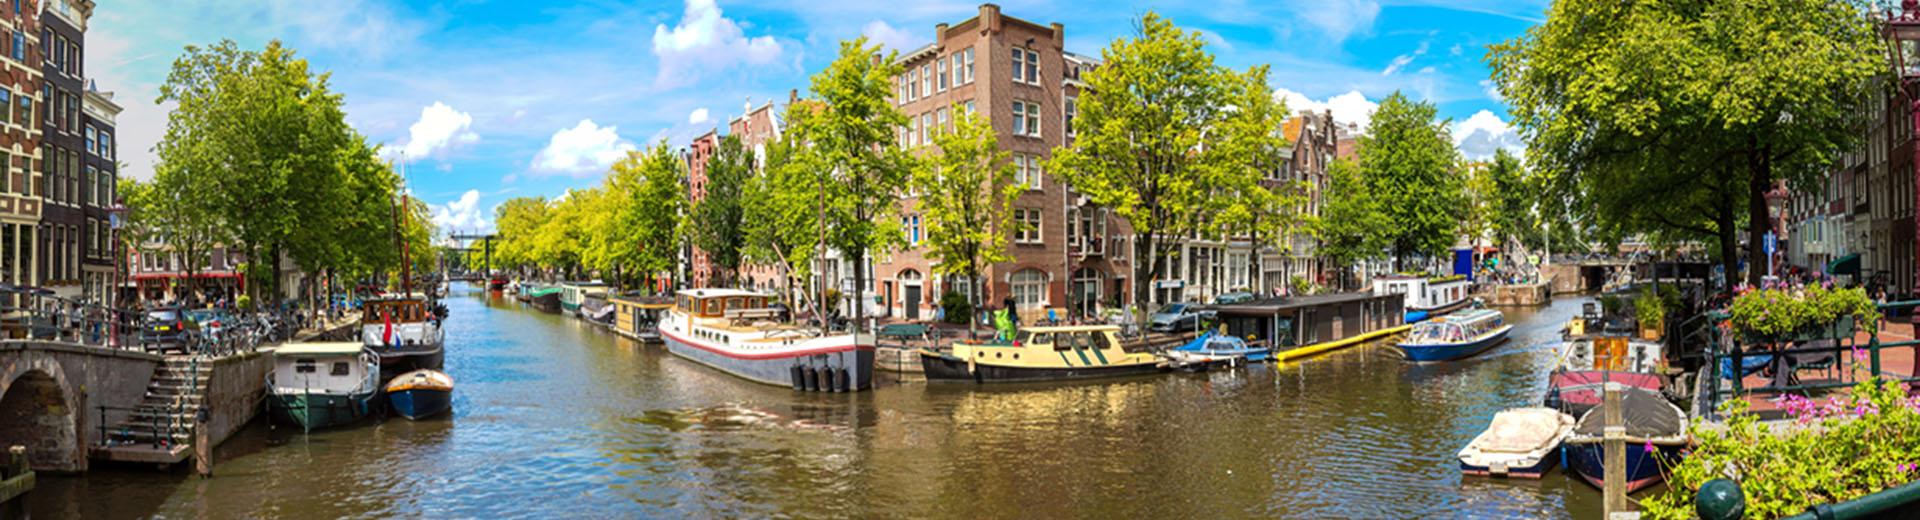 Voyage en groupe Amsterdam - offre confort avion